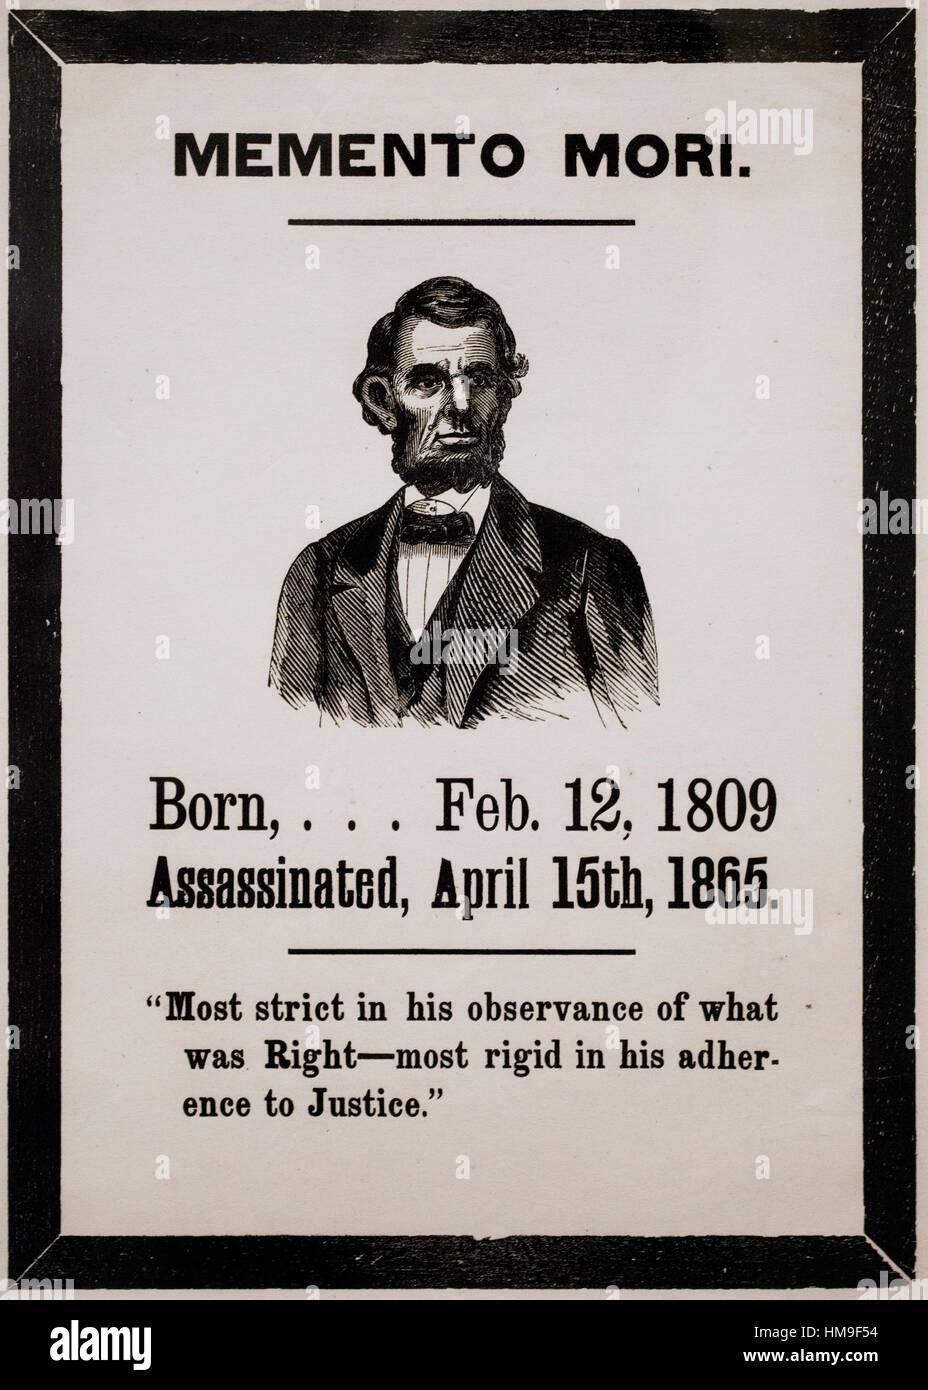 Memento mori of Abraham Lincoln, woodcut print, circa 1865 - USA - Stock Image